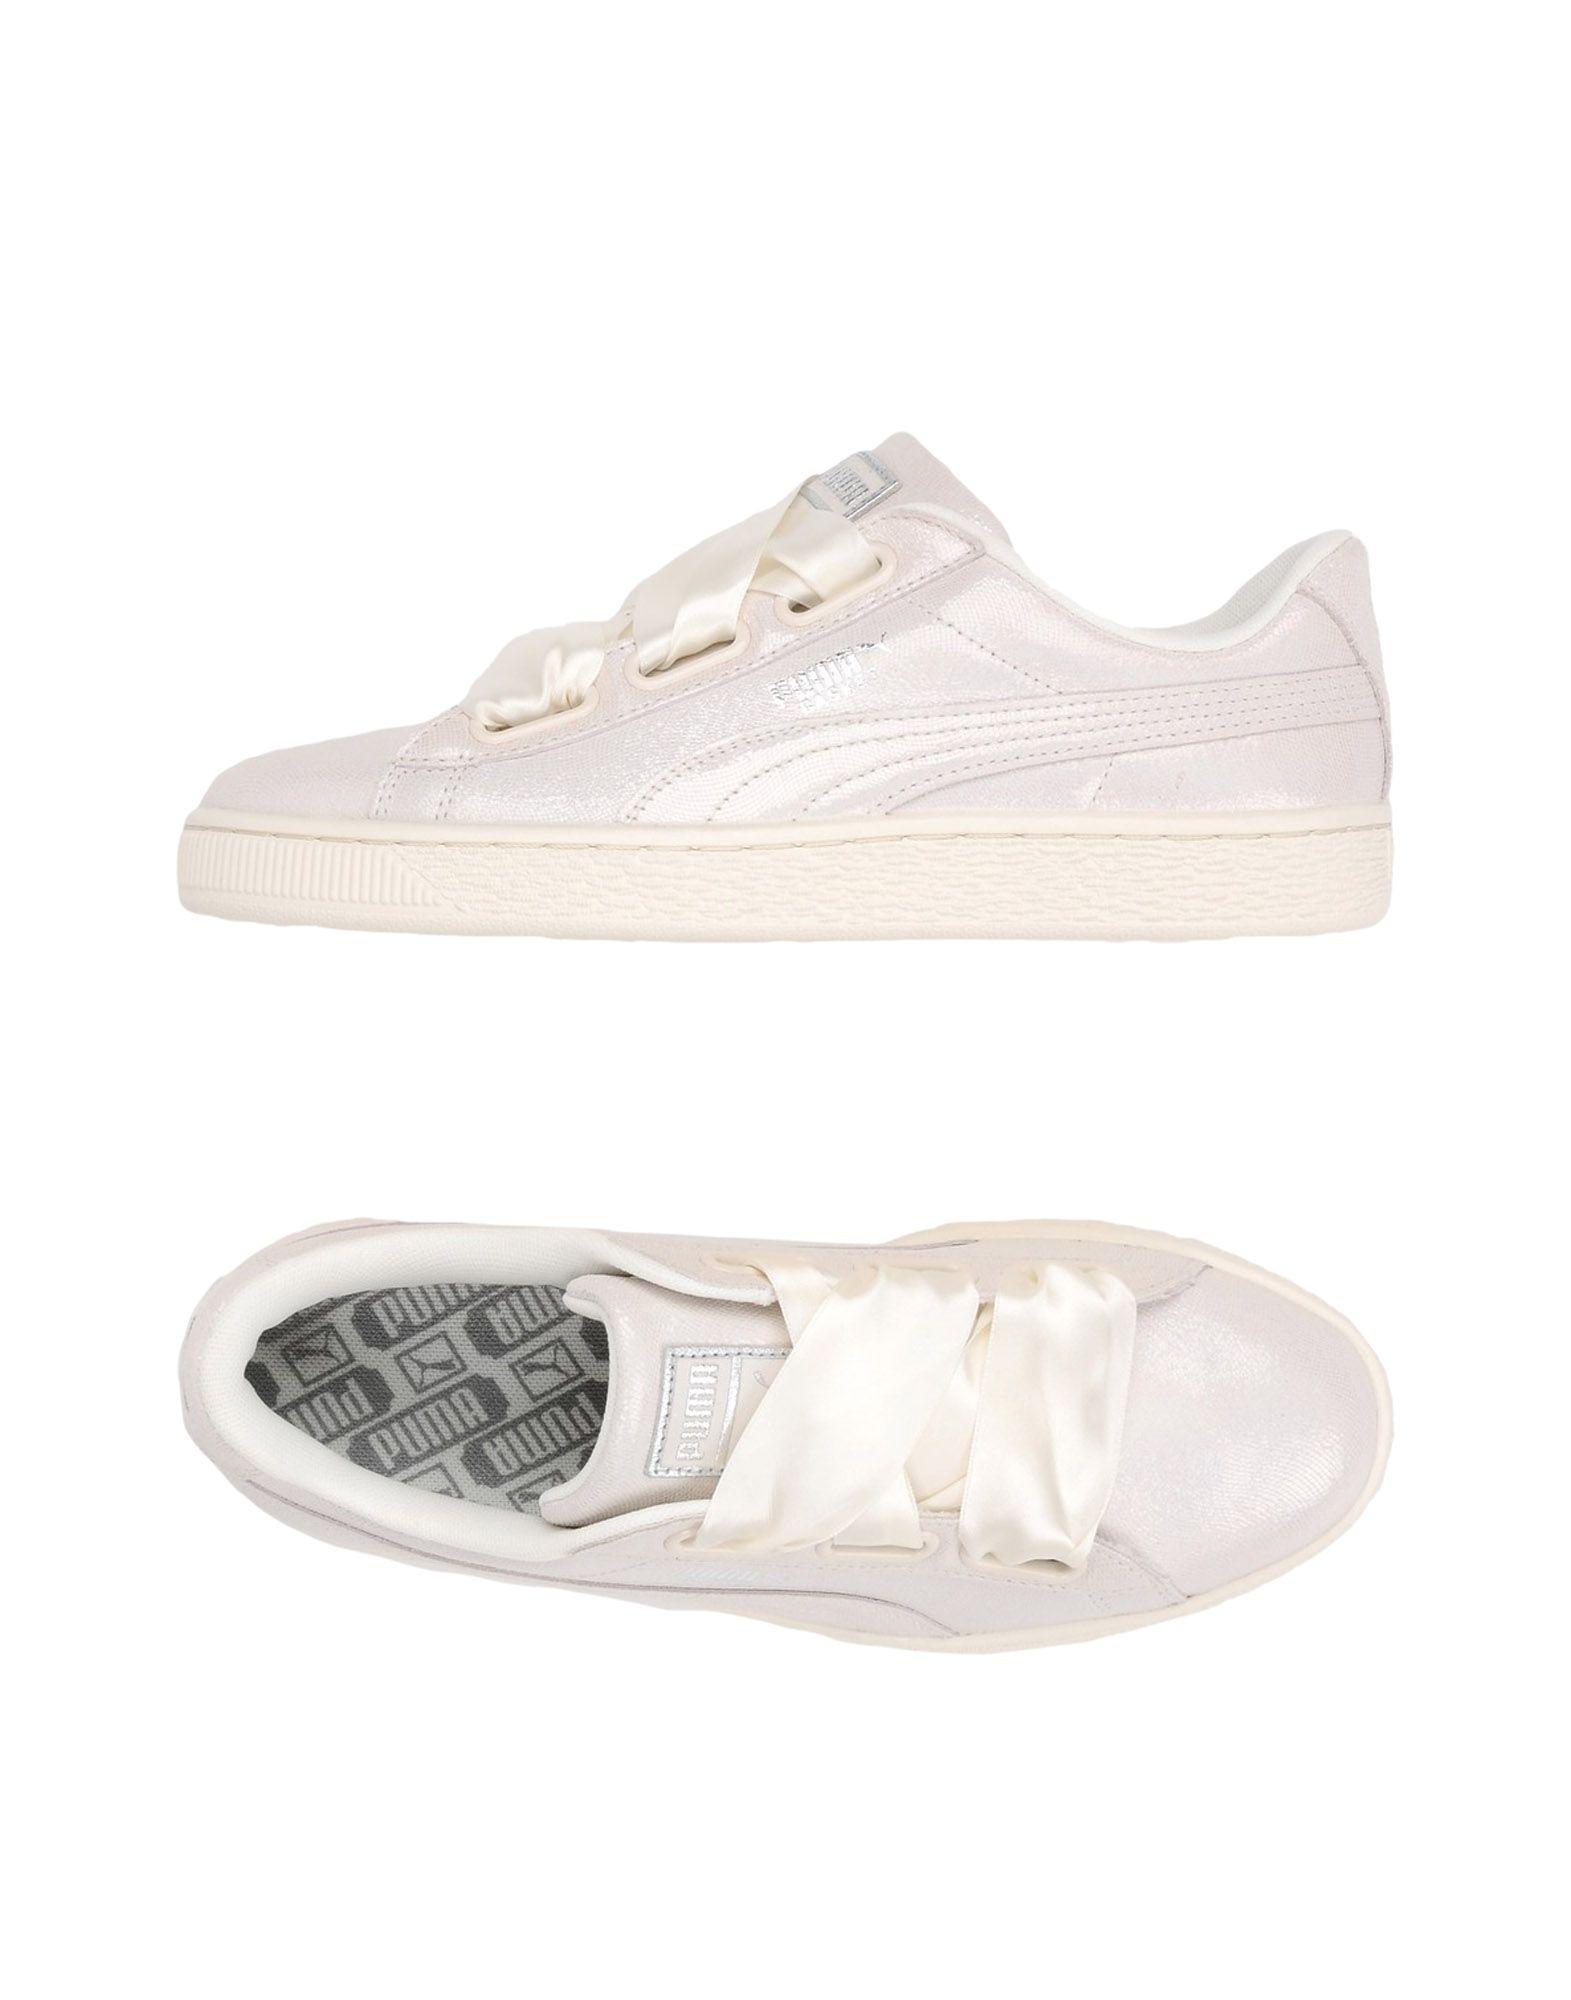 Sneakers Puma Basket Heart Ns Wns - Donna - Acquista online su